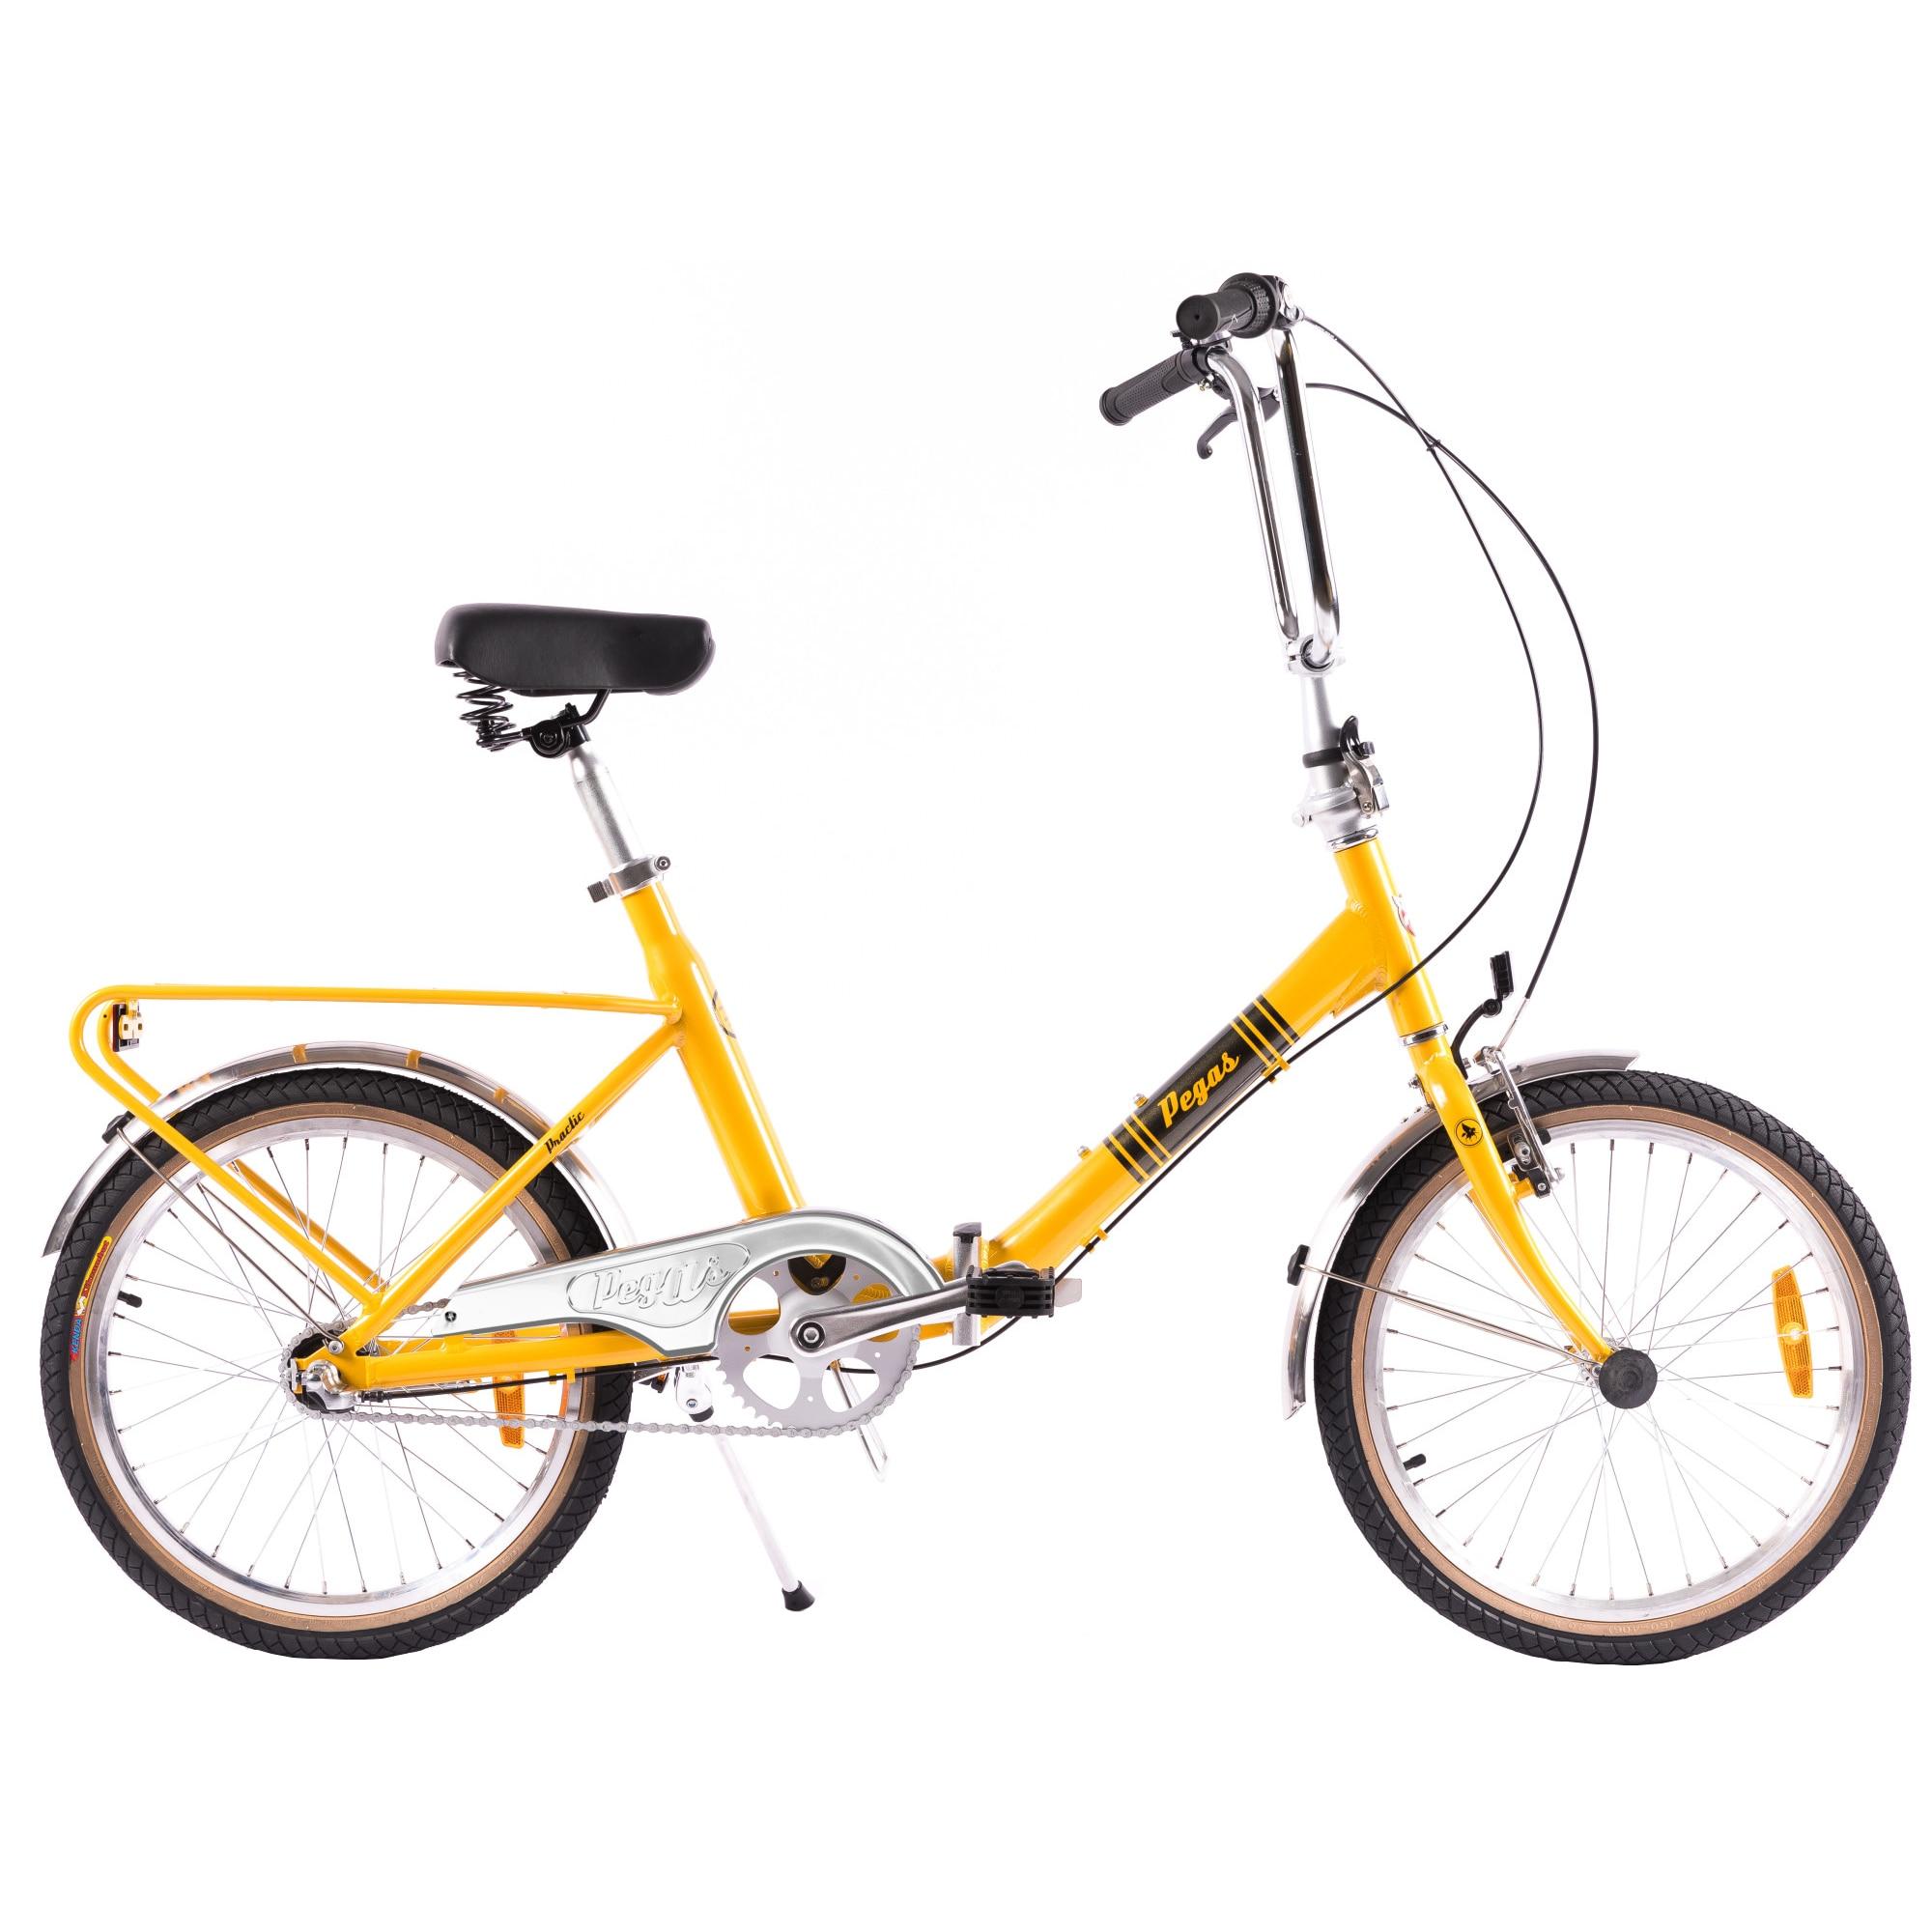 Fotografie Bicicleta pliabila Pegas Practic Retro aluminiu, Galben Bondar